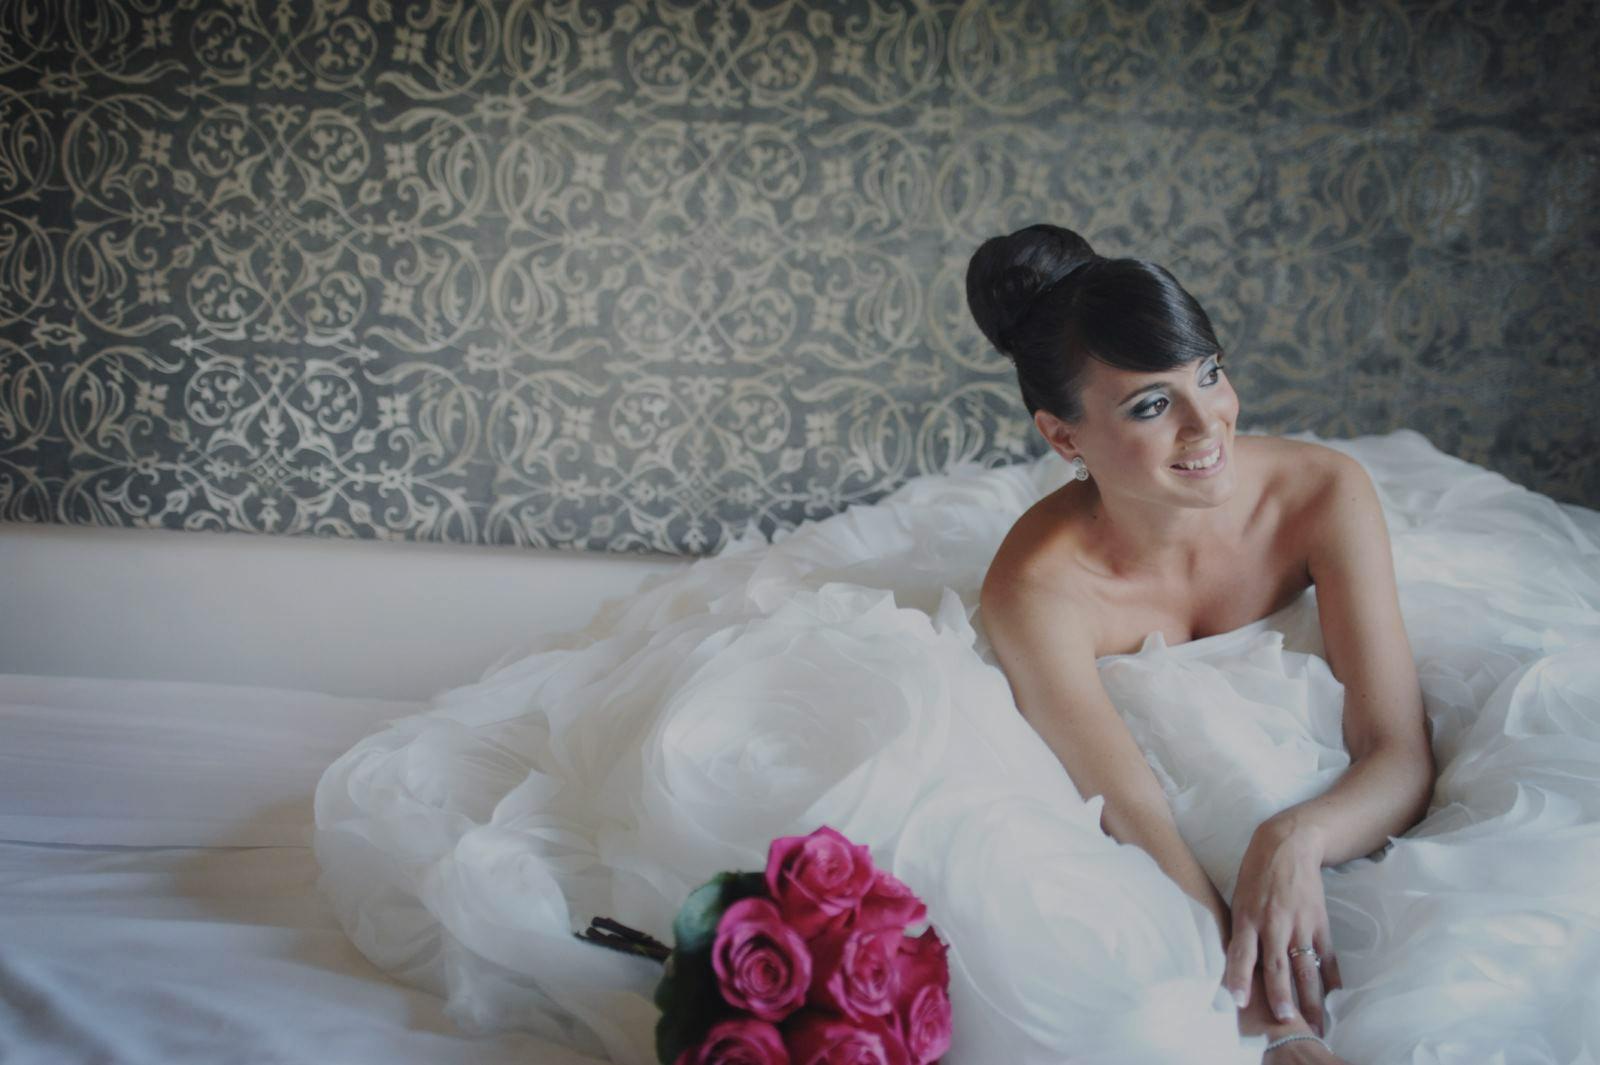 Bodakids wedding photographers